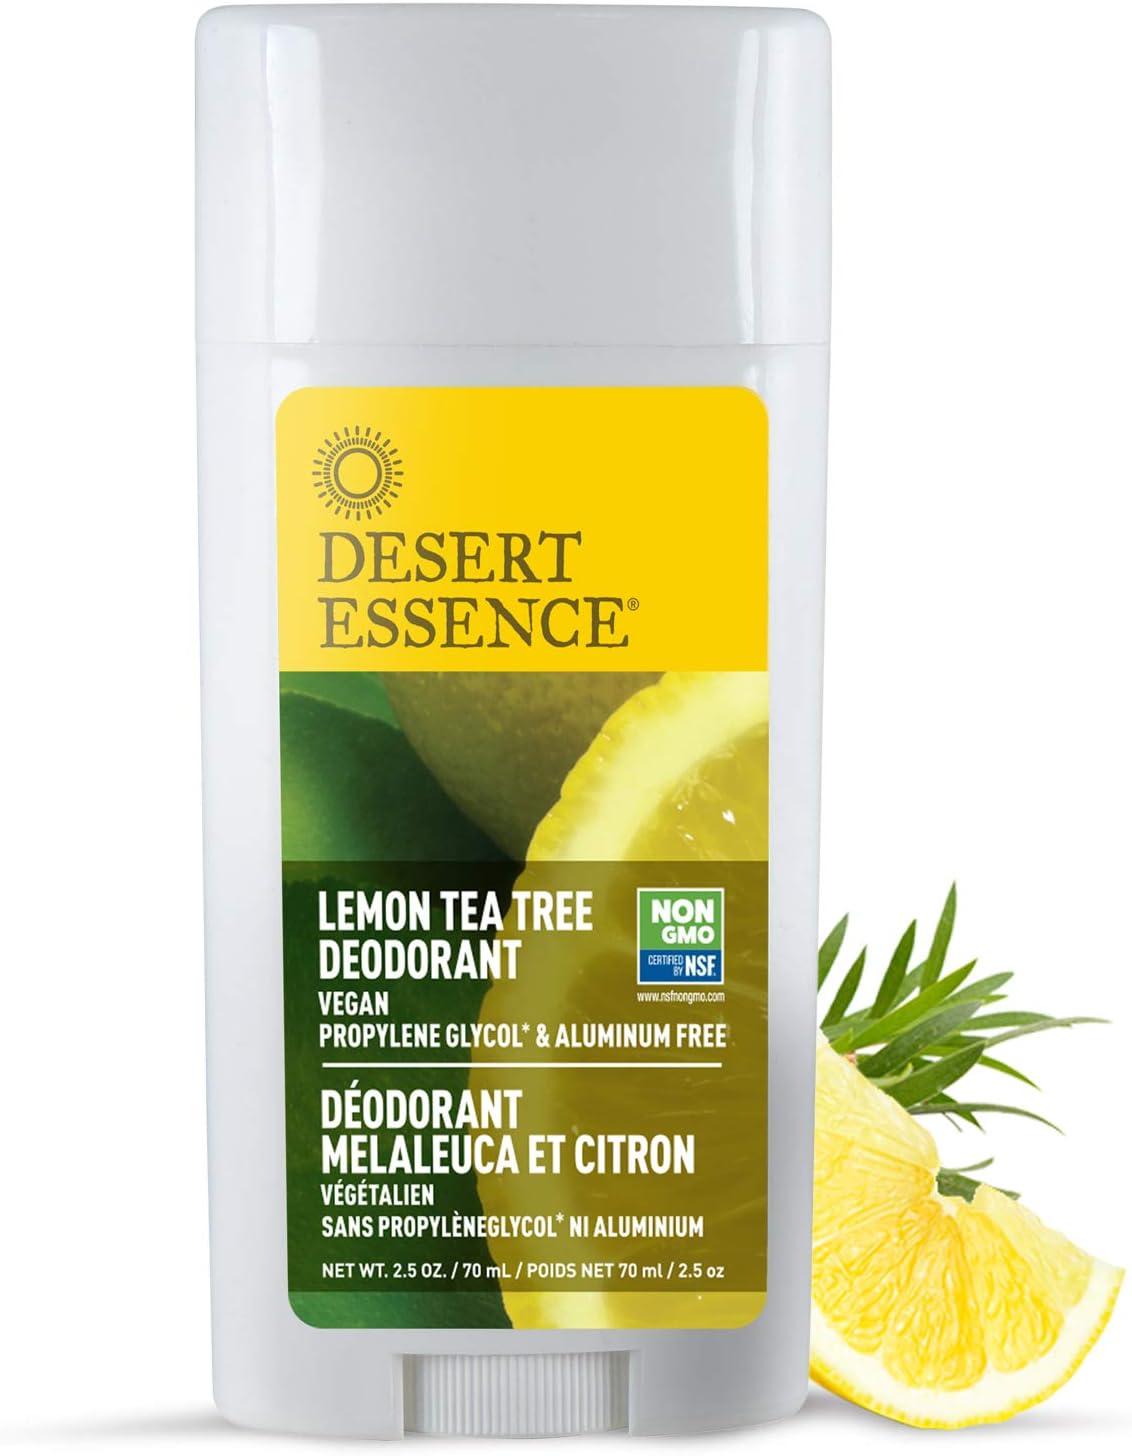 Desert Essence Lemon Tea Tree Deodorant - 2.5 Ounce - Pack of 2 - Long Lasting Protection - Propylene Glycol & Aluminum Free - Witch Hazel - Botanical Oils - Neutralizes Odor - Citrus Scent